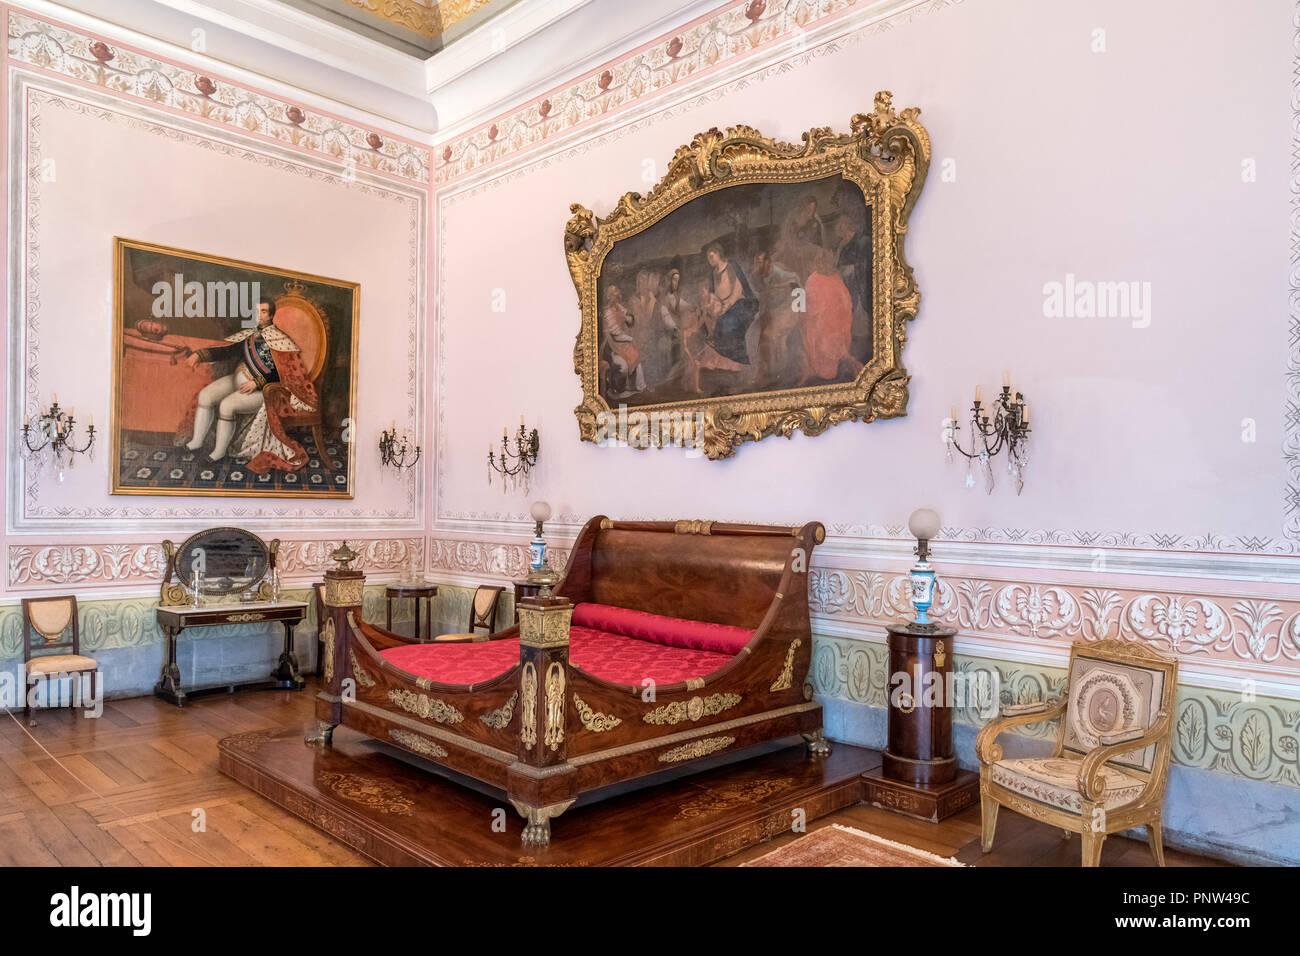 Bedroom in the Palace of Mafra ( Mosteiro Palacio Nacional de Mafra ), Mafra, Portugal - Stock Image